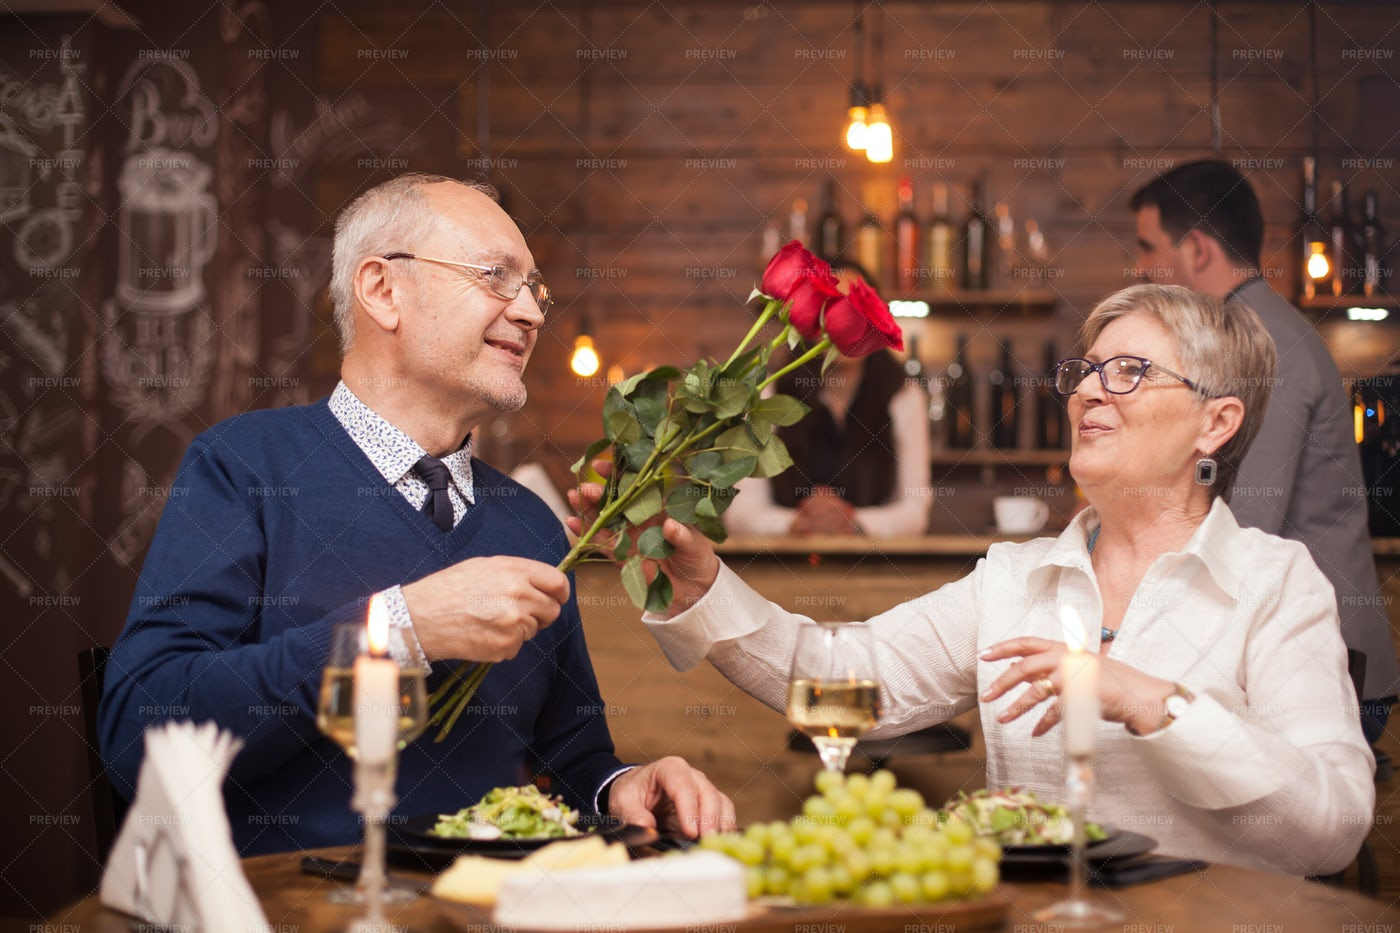 Partner Giving Roses: Stock Photos